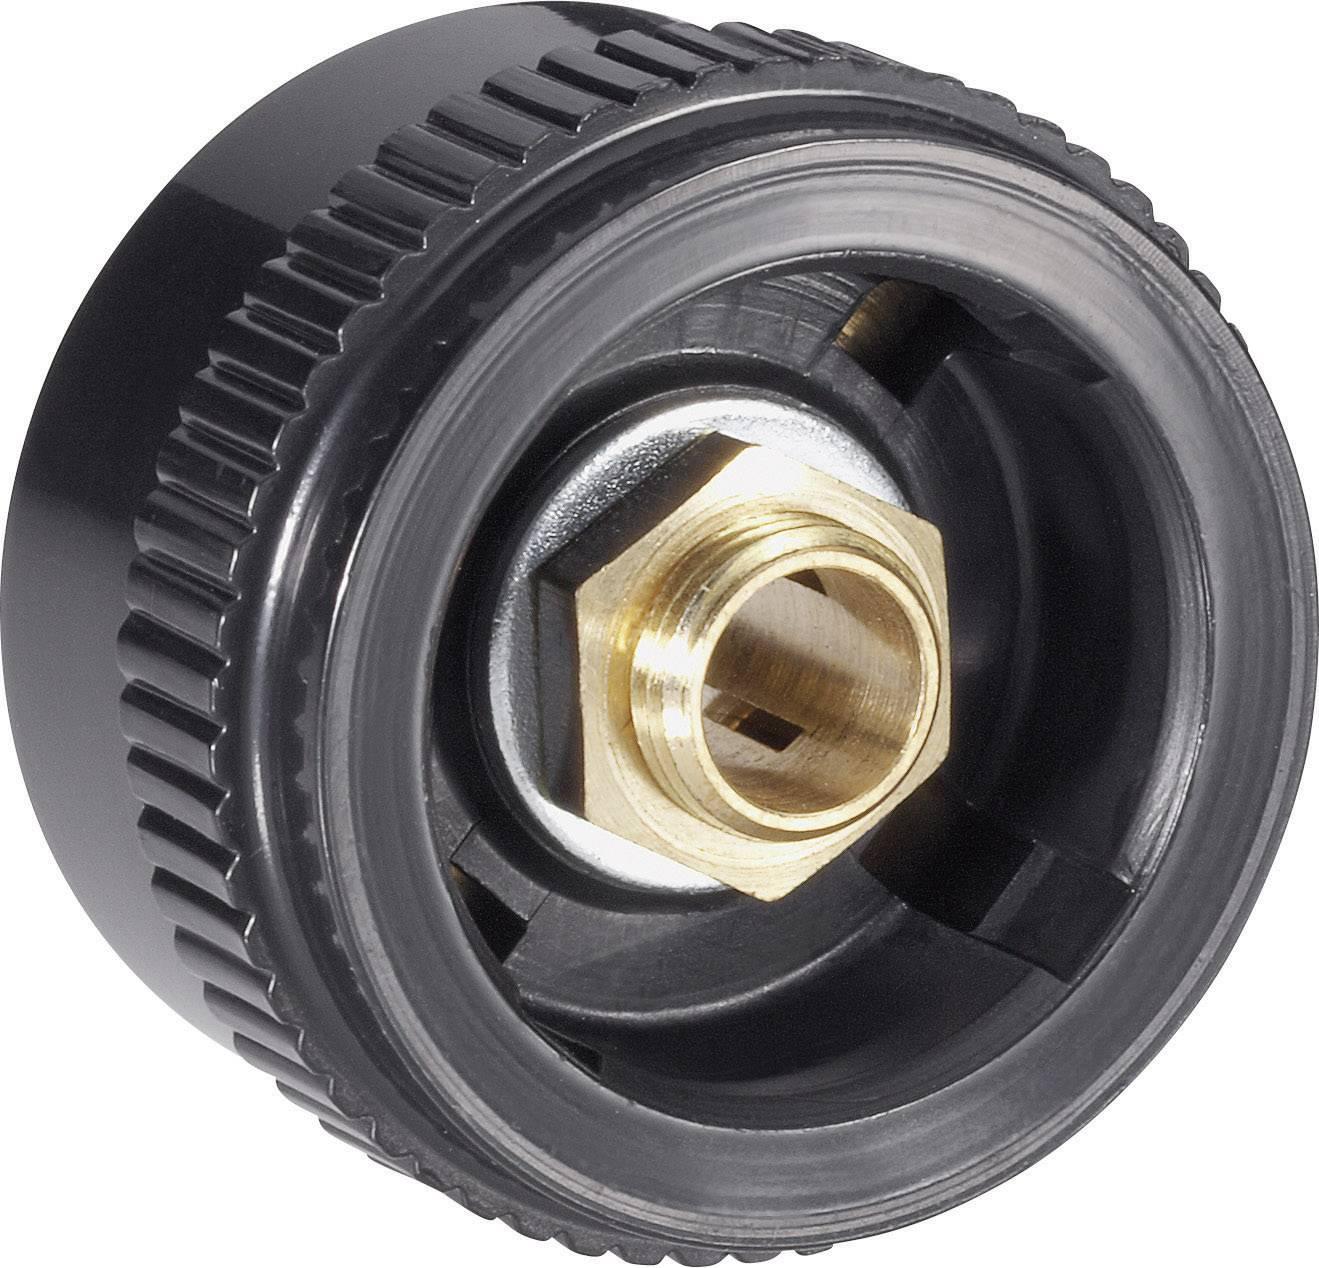 Otočný knoflík s kleštinovým uchycením Mentor 4132.603, pro sérii 20, 6 mm, černá